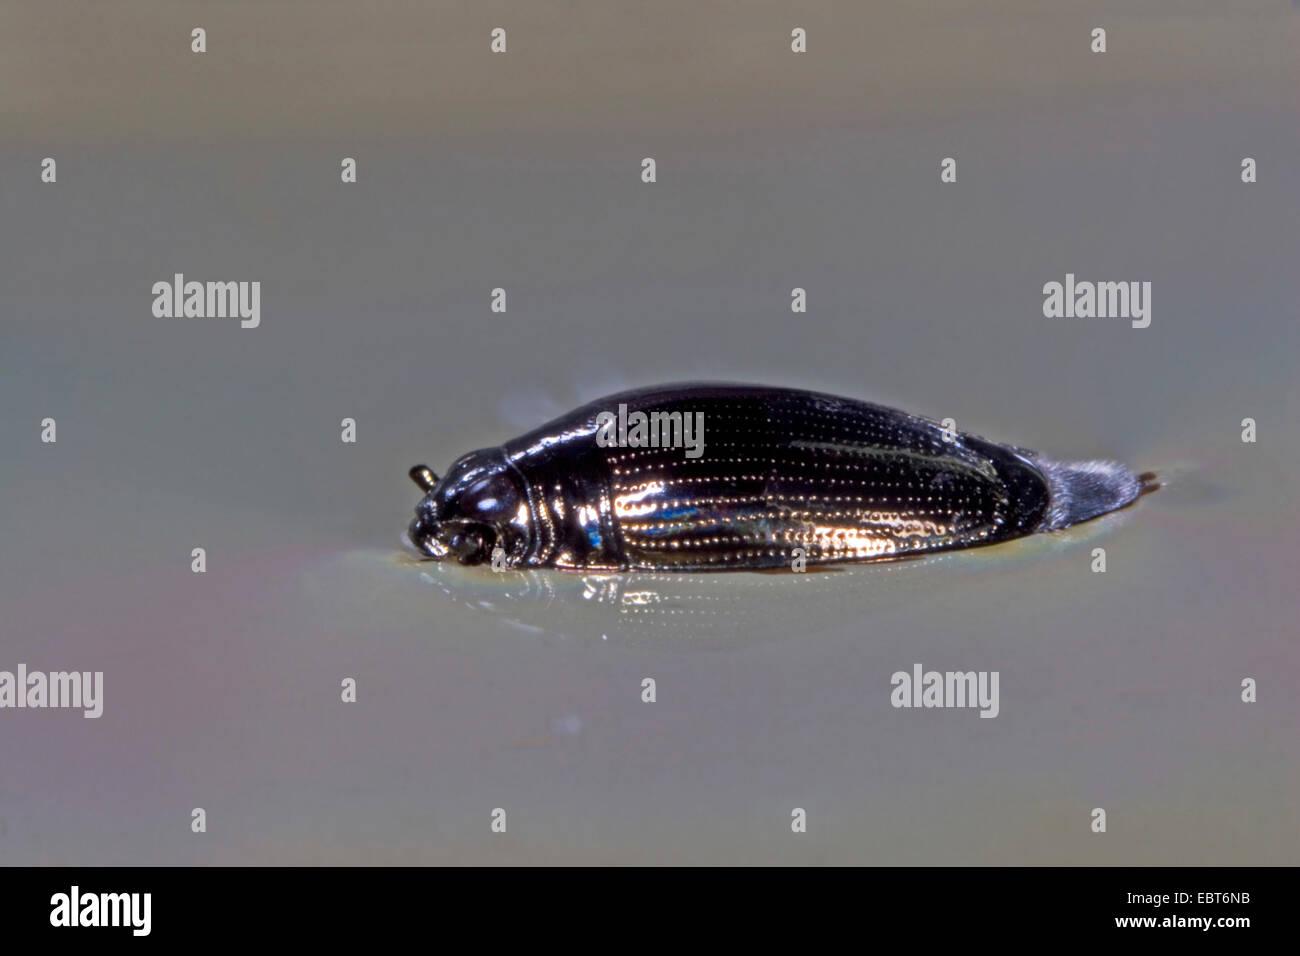 common whirligig beetle (Gyrinus substriatus, Gyrinus natator), on water surface, Germany Stock Photo